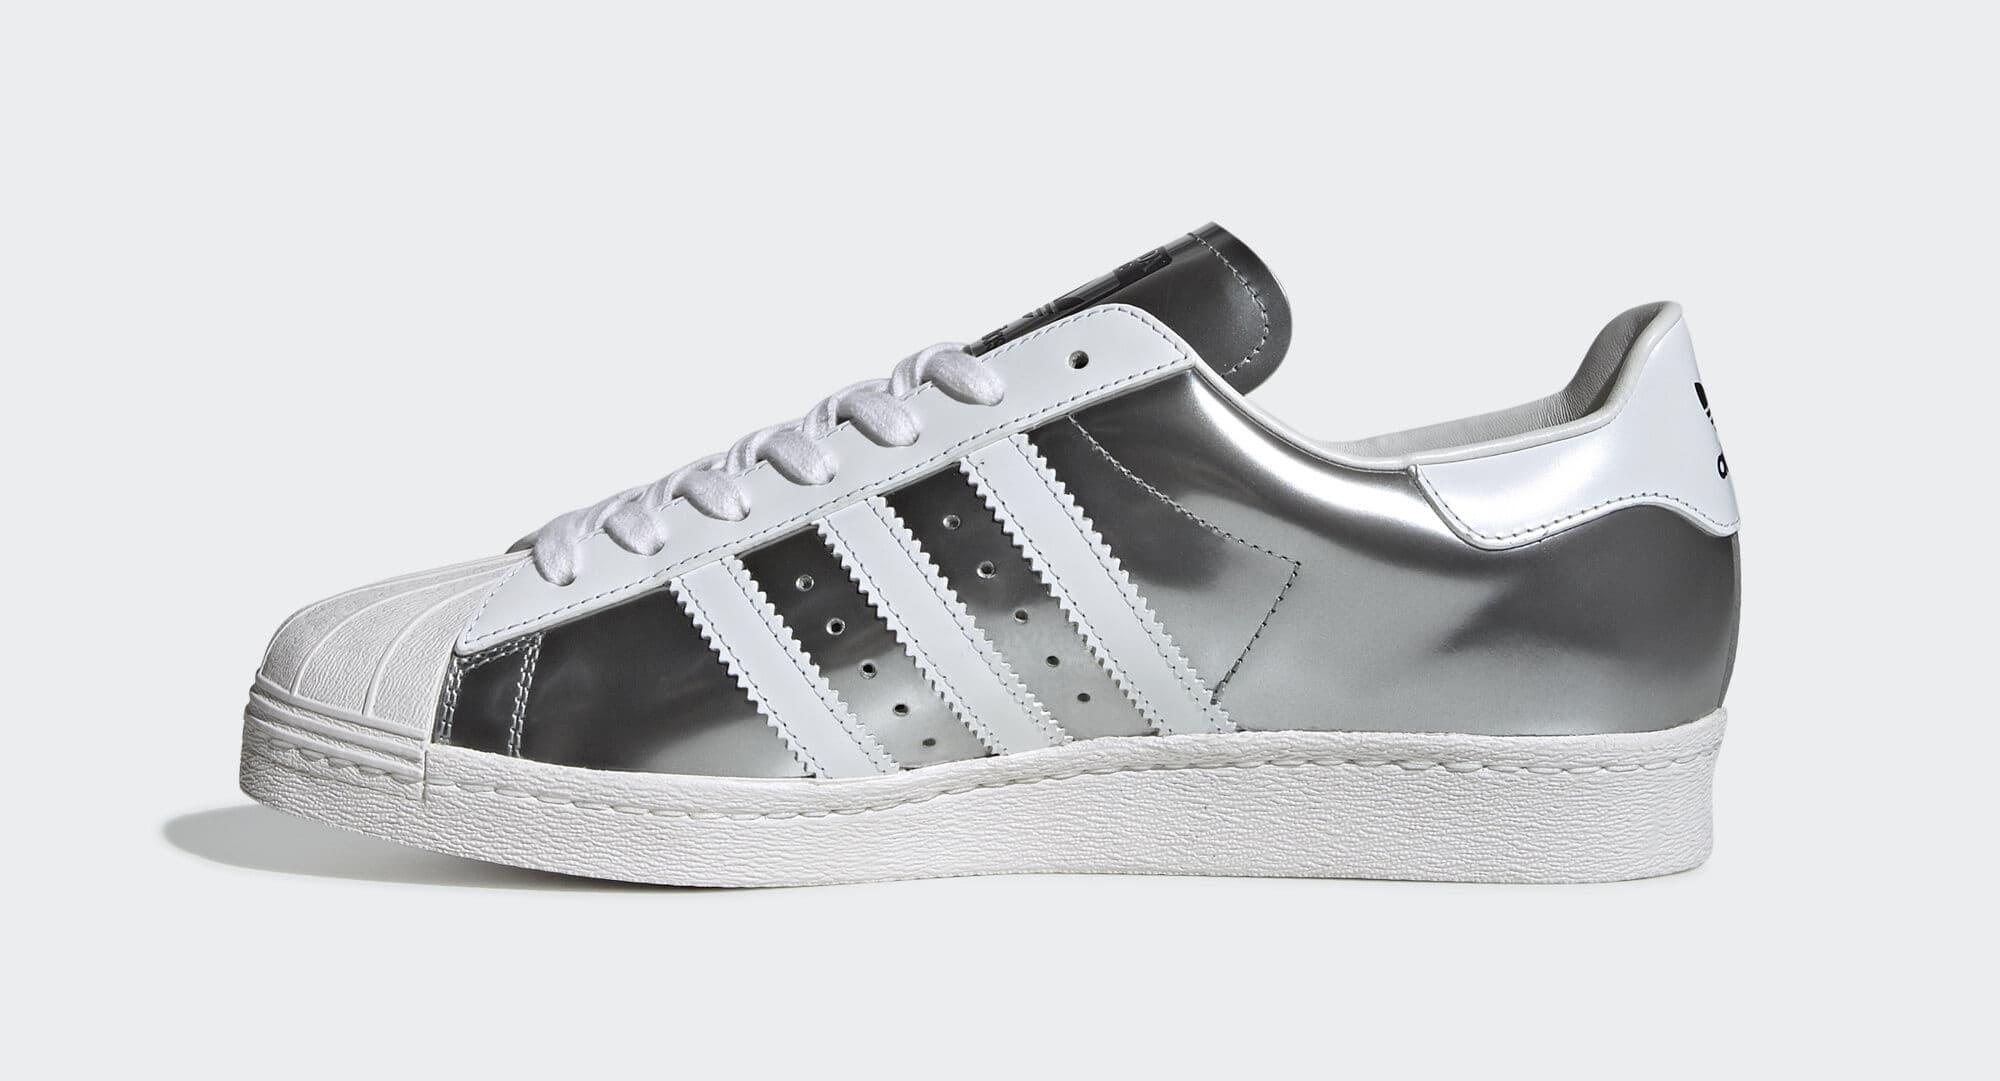 Prada x Adidas Superstar 'Silver Metallic' FX4546 (Medial)